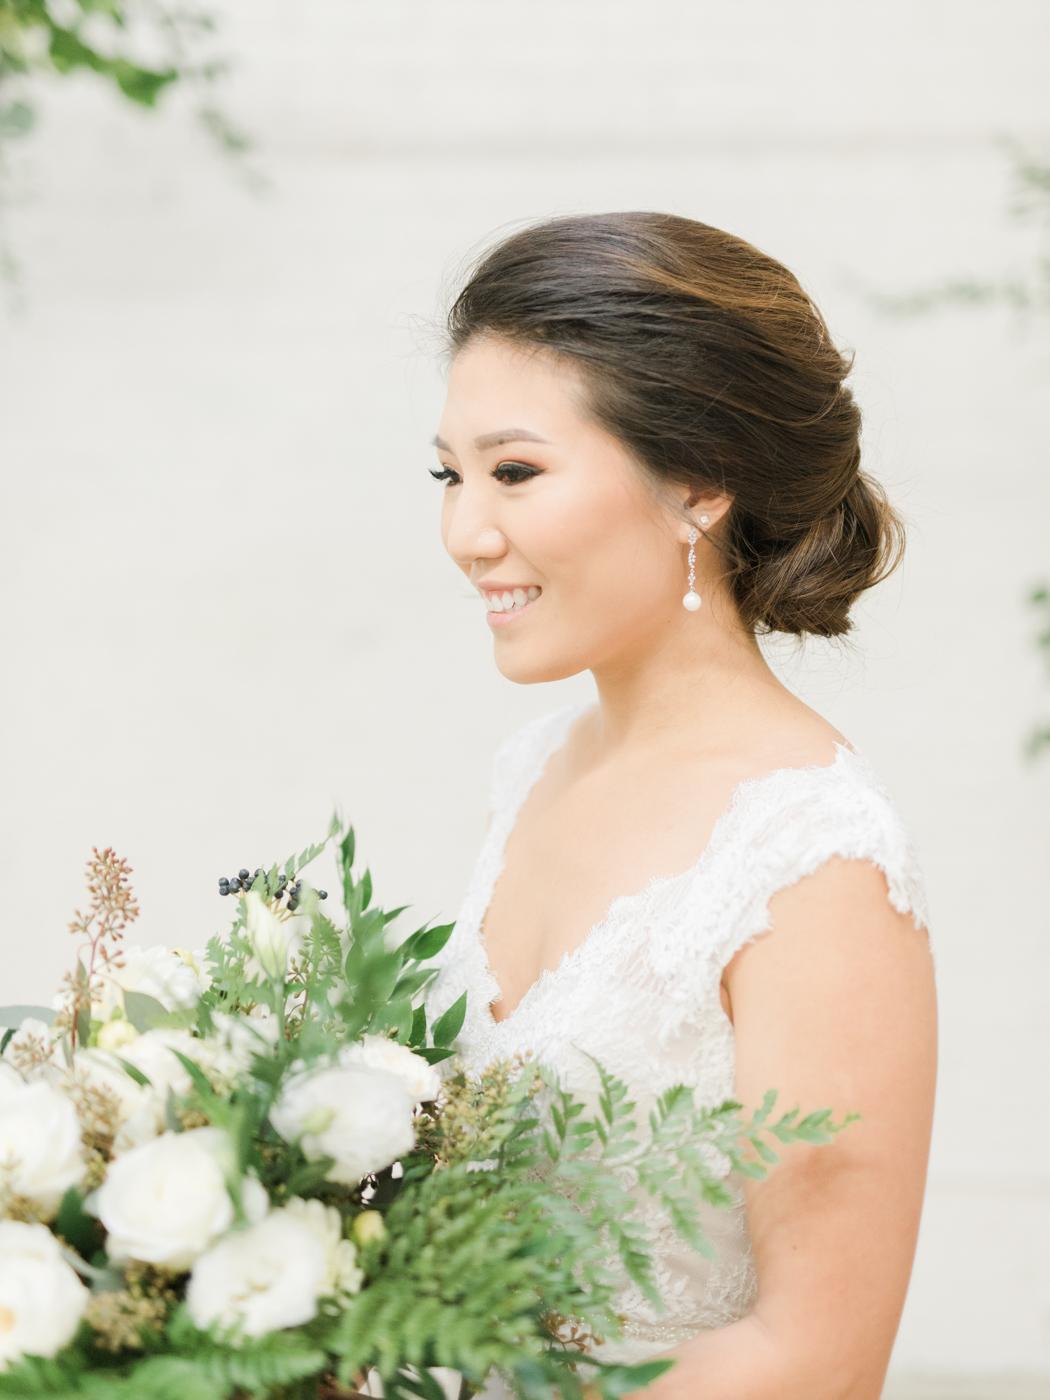 Modern_Wedding_HNYPT_Honeypot_LA_Photographer_Los_Angeles_cover-61.jpg